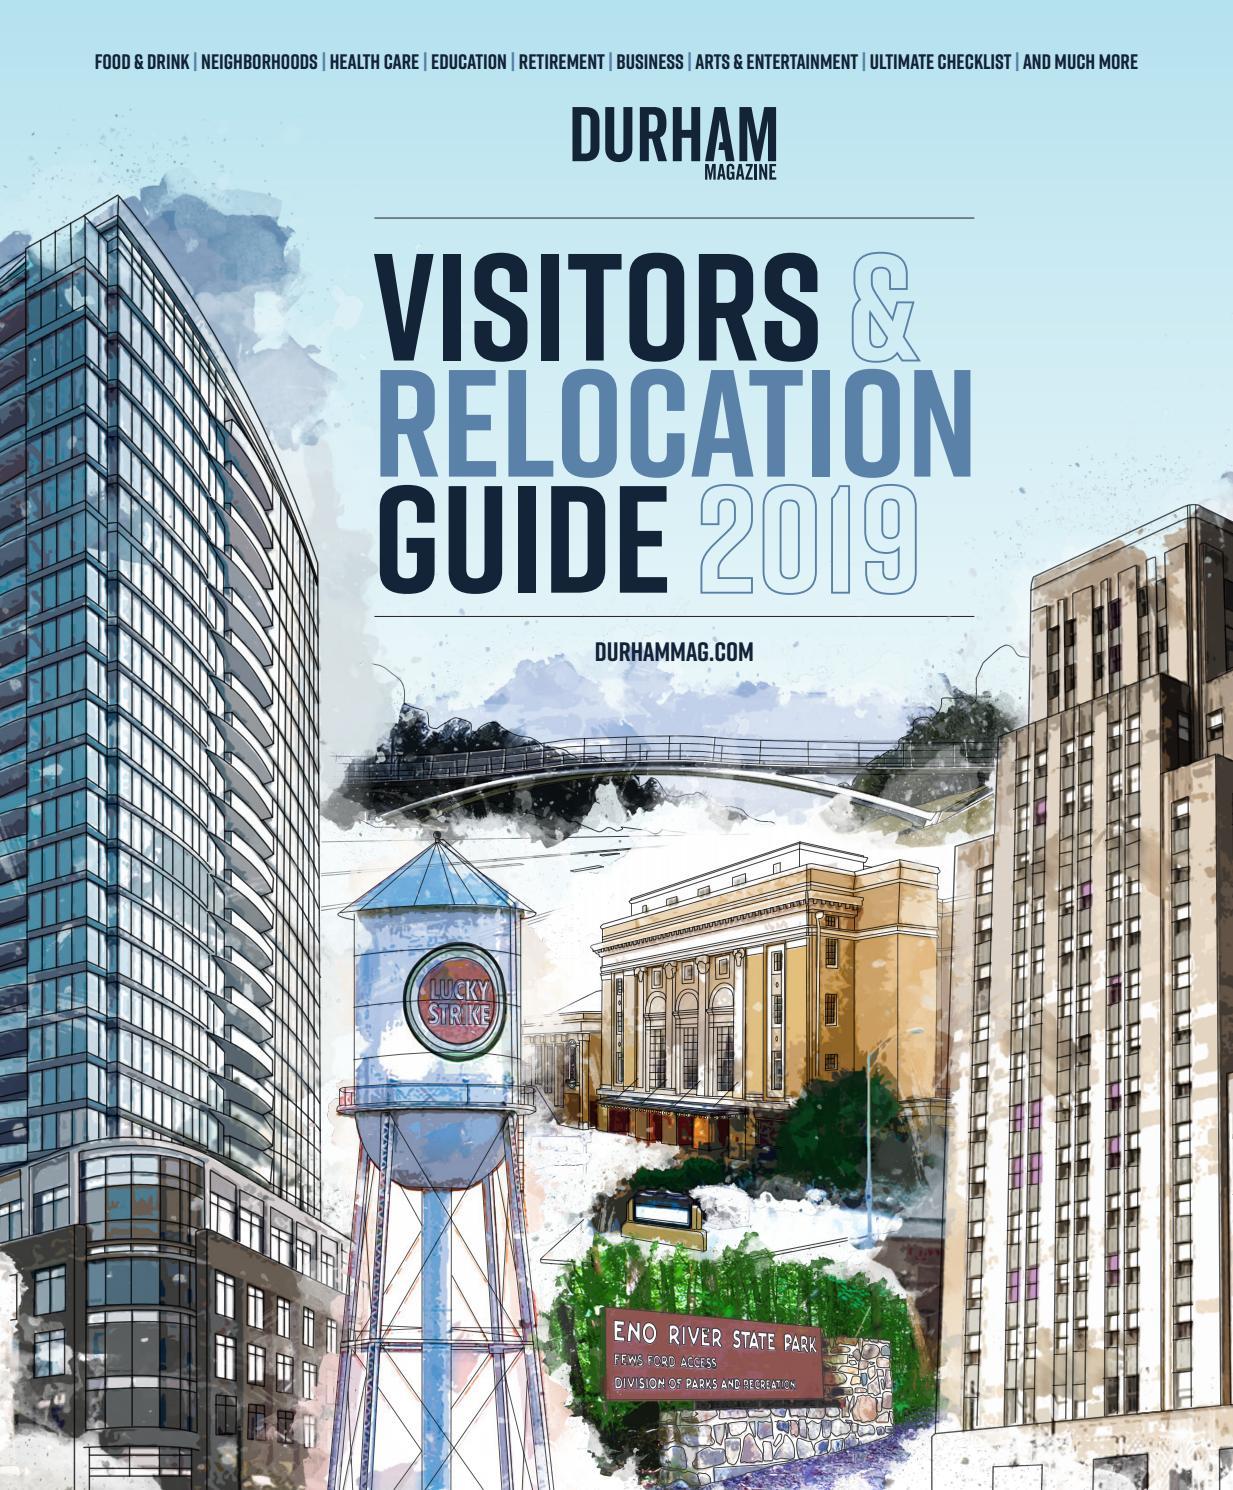 cee315e4e10 Durham Magazine s 2019 Visitors   Relocation Guide by Shannon Media - issuu